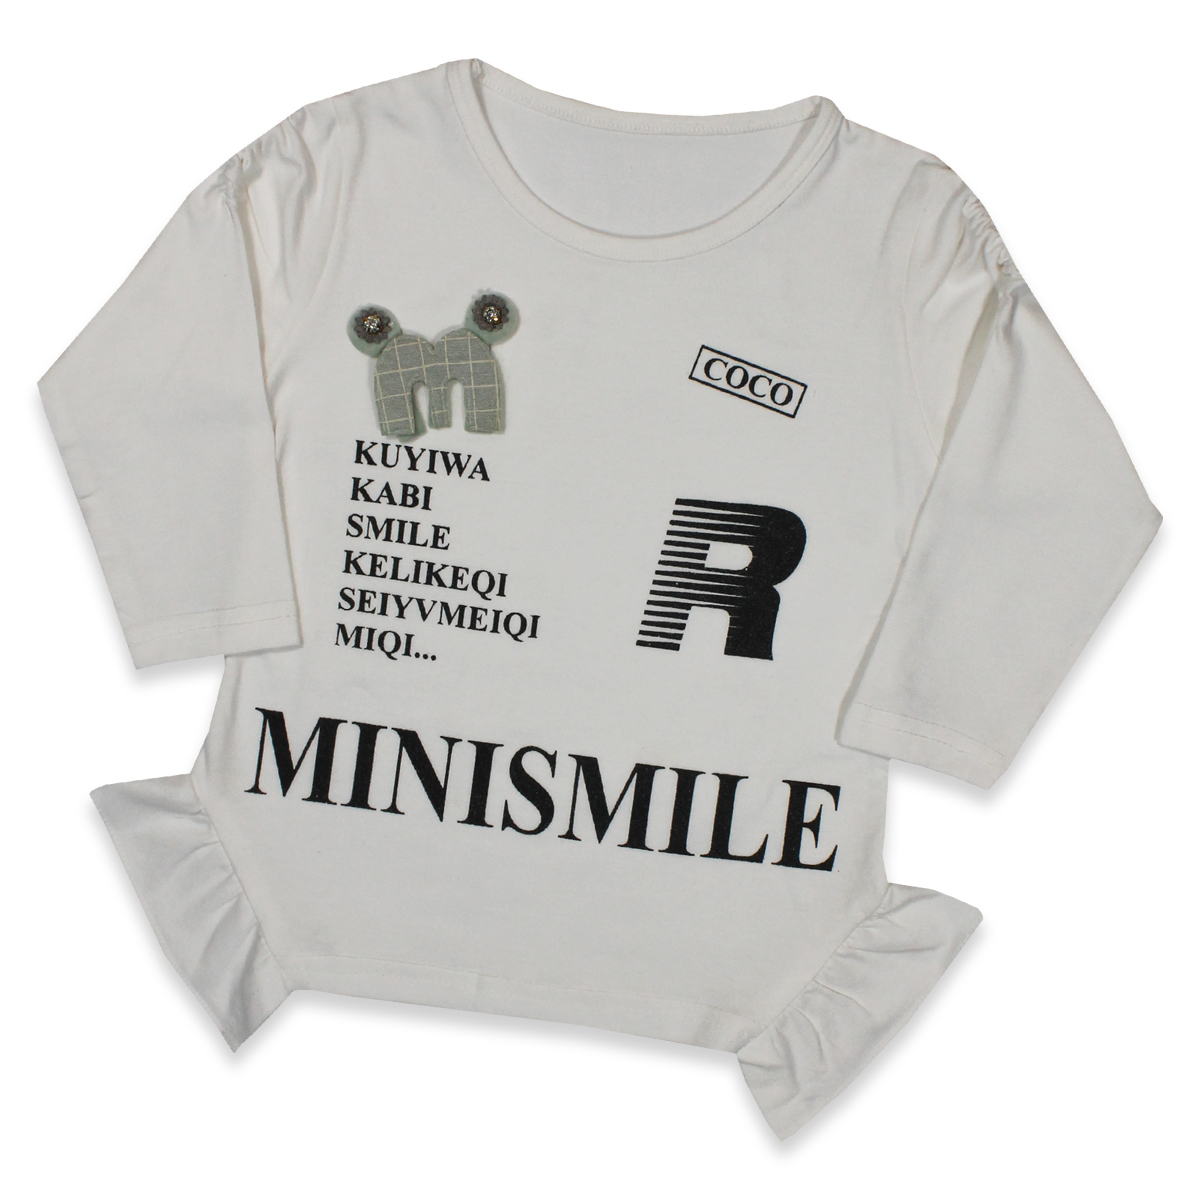 Cut Price 2.5yrs - 7yrs T-shirt For Girls M-smile